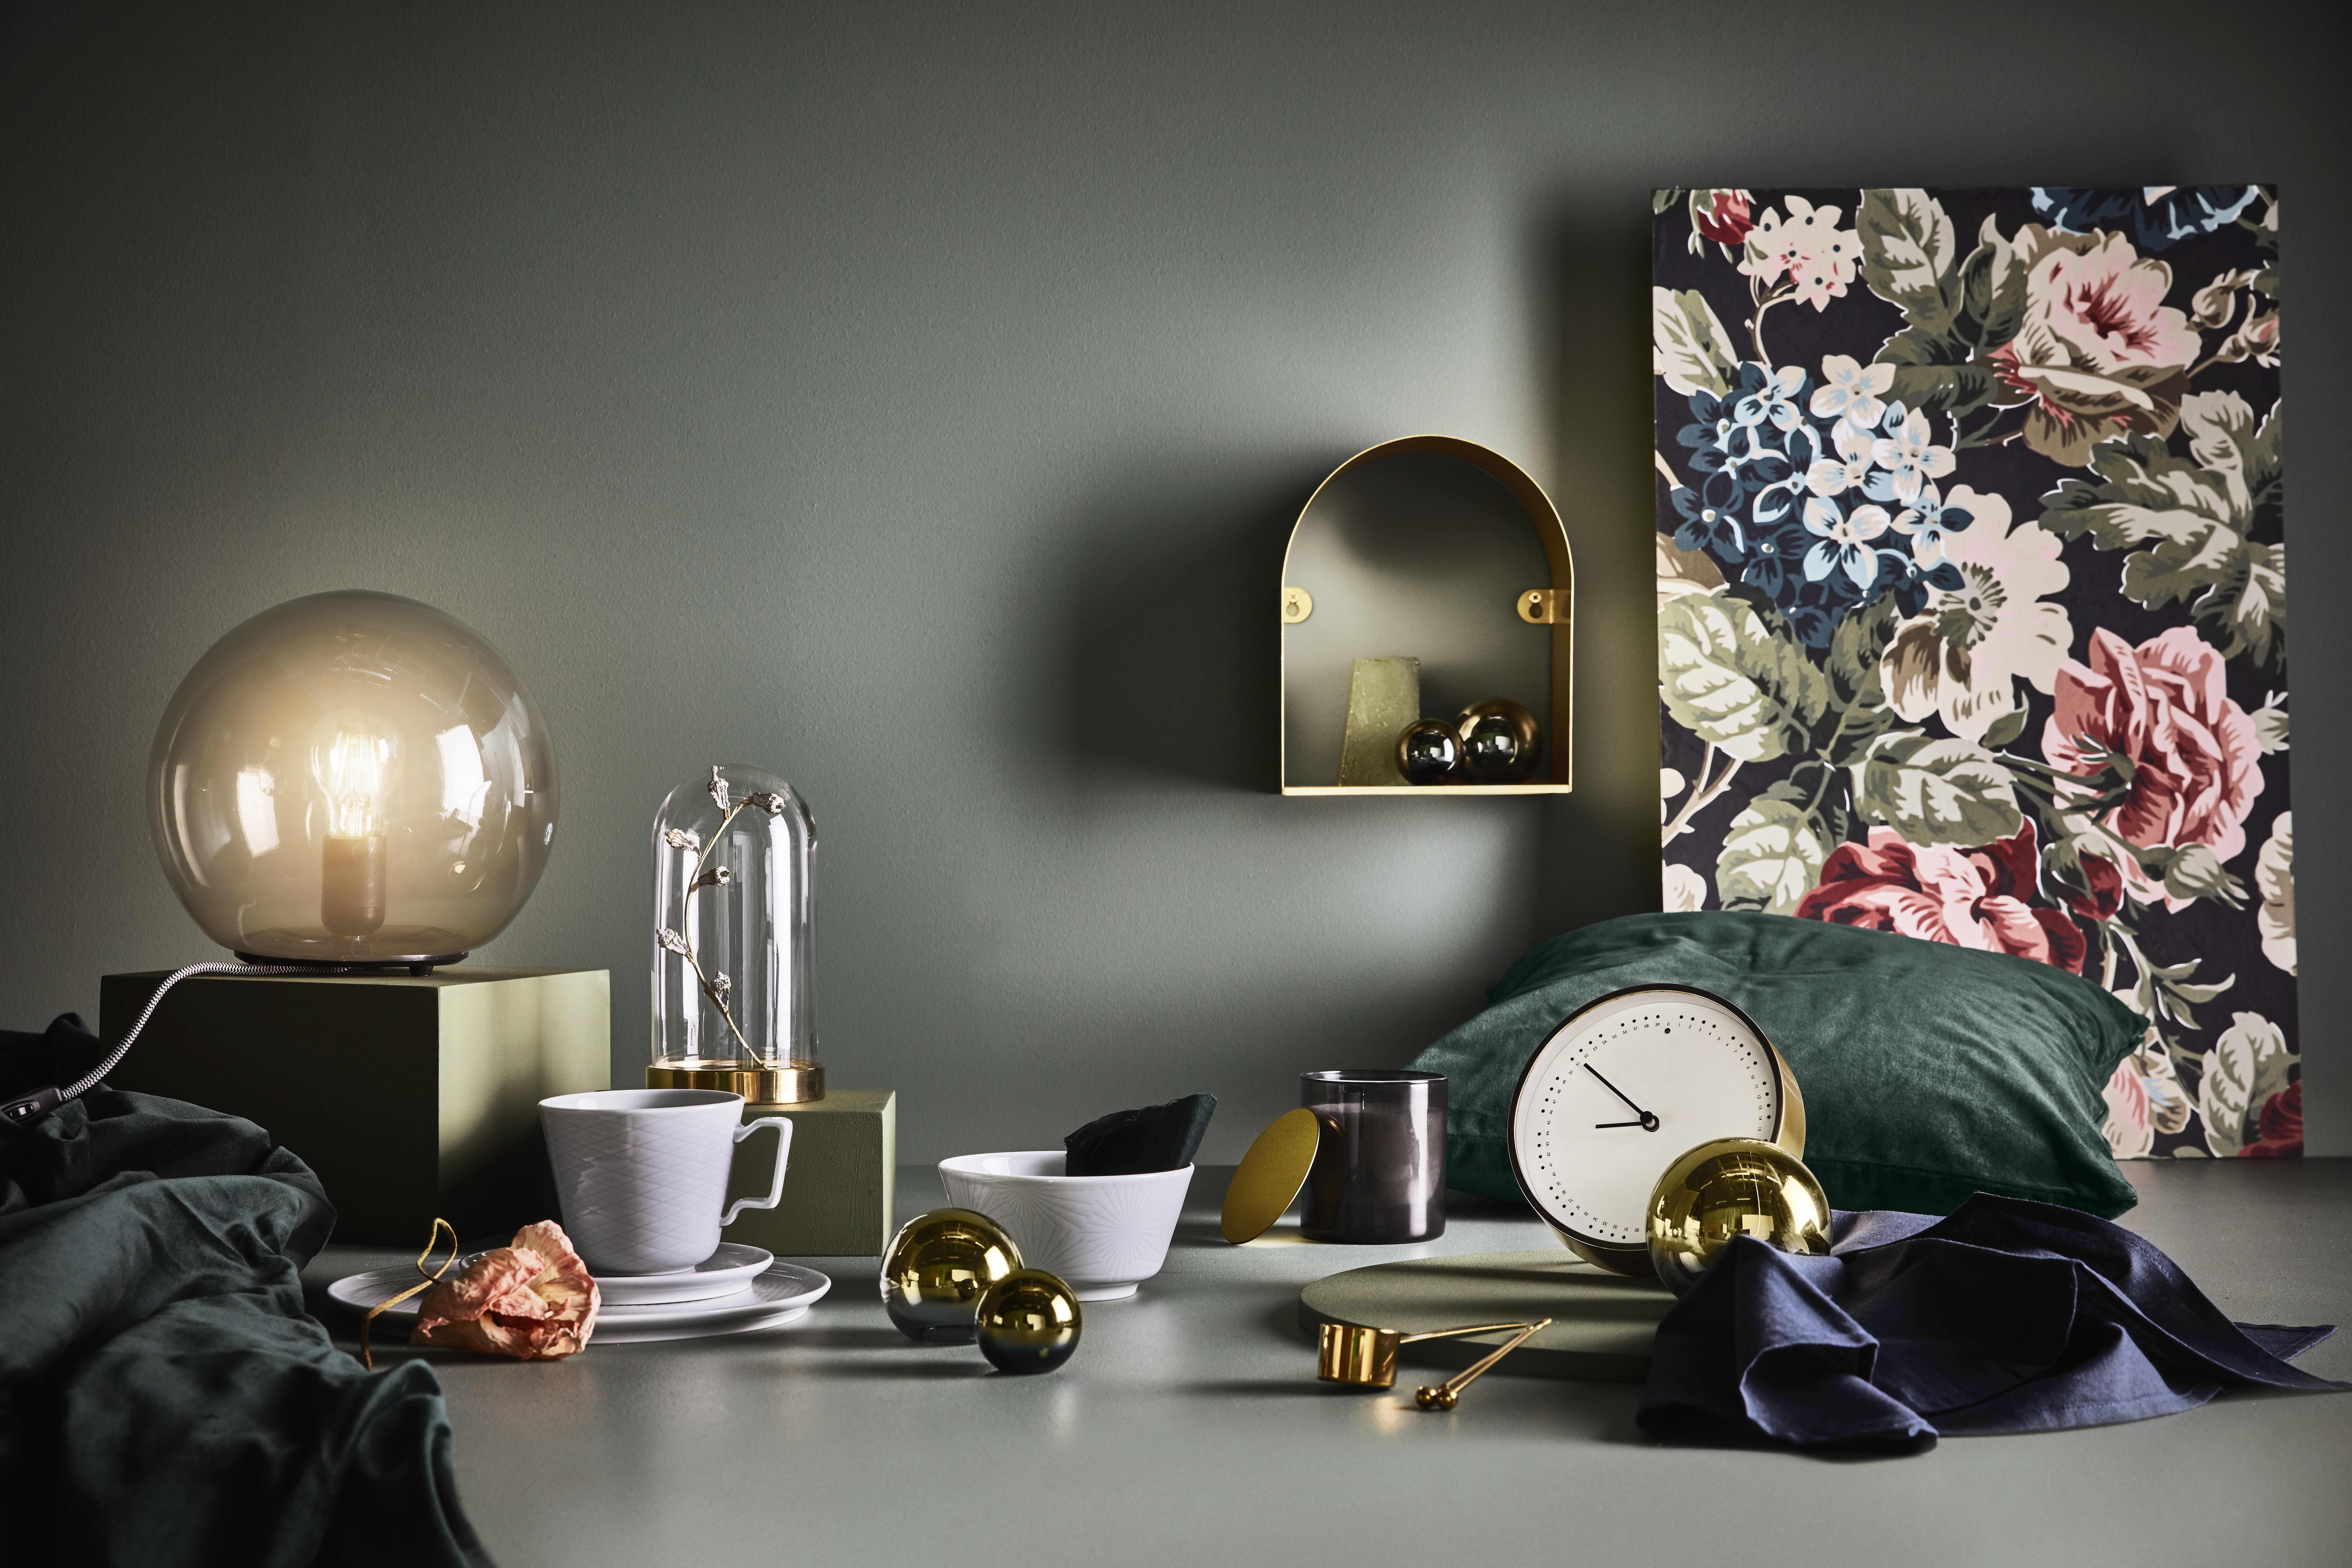 Ikea 2019 Catalog Home Decor Trend Predictions Apartment Therapy